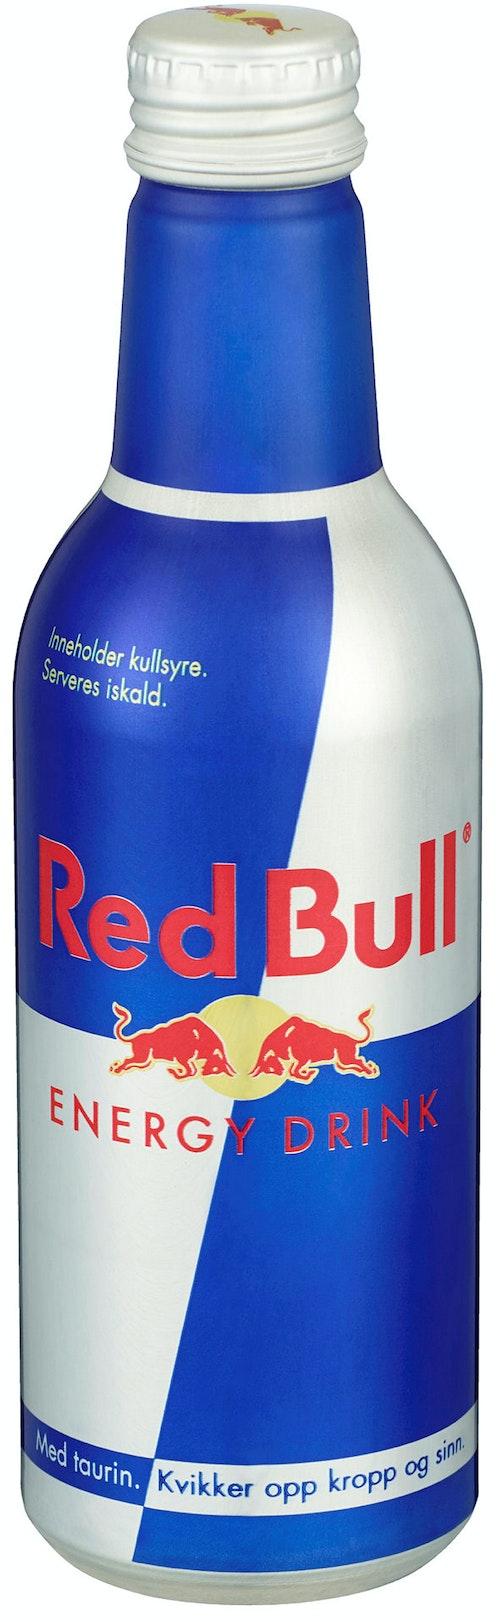 Red Bull Red Bull Flaske, 0,33 l